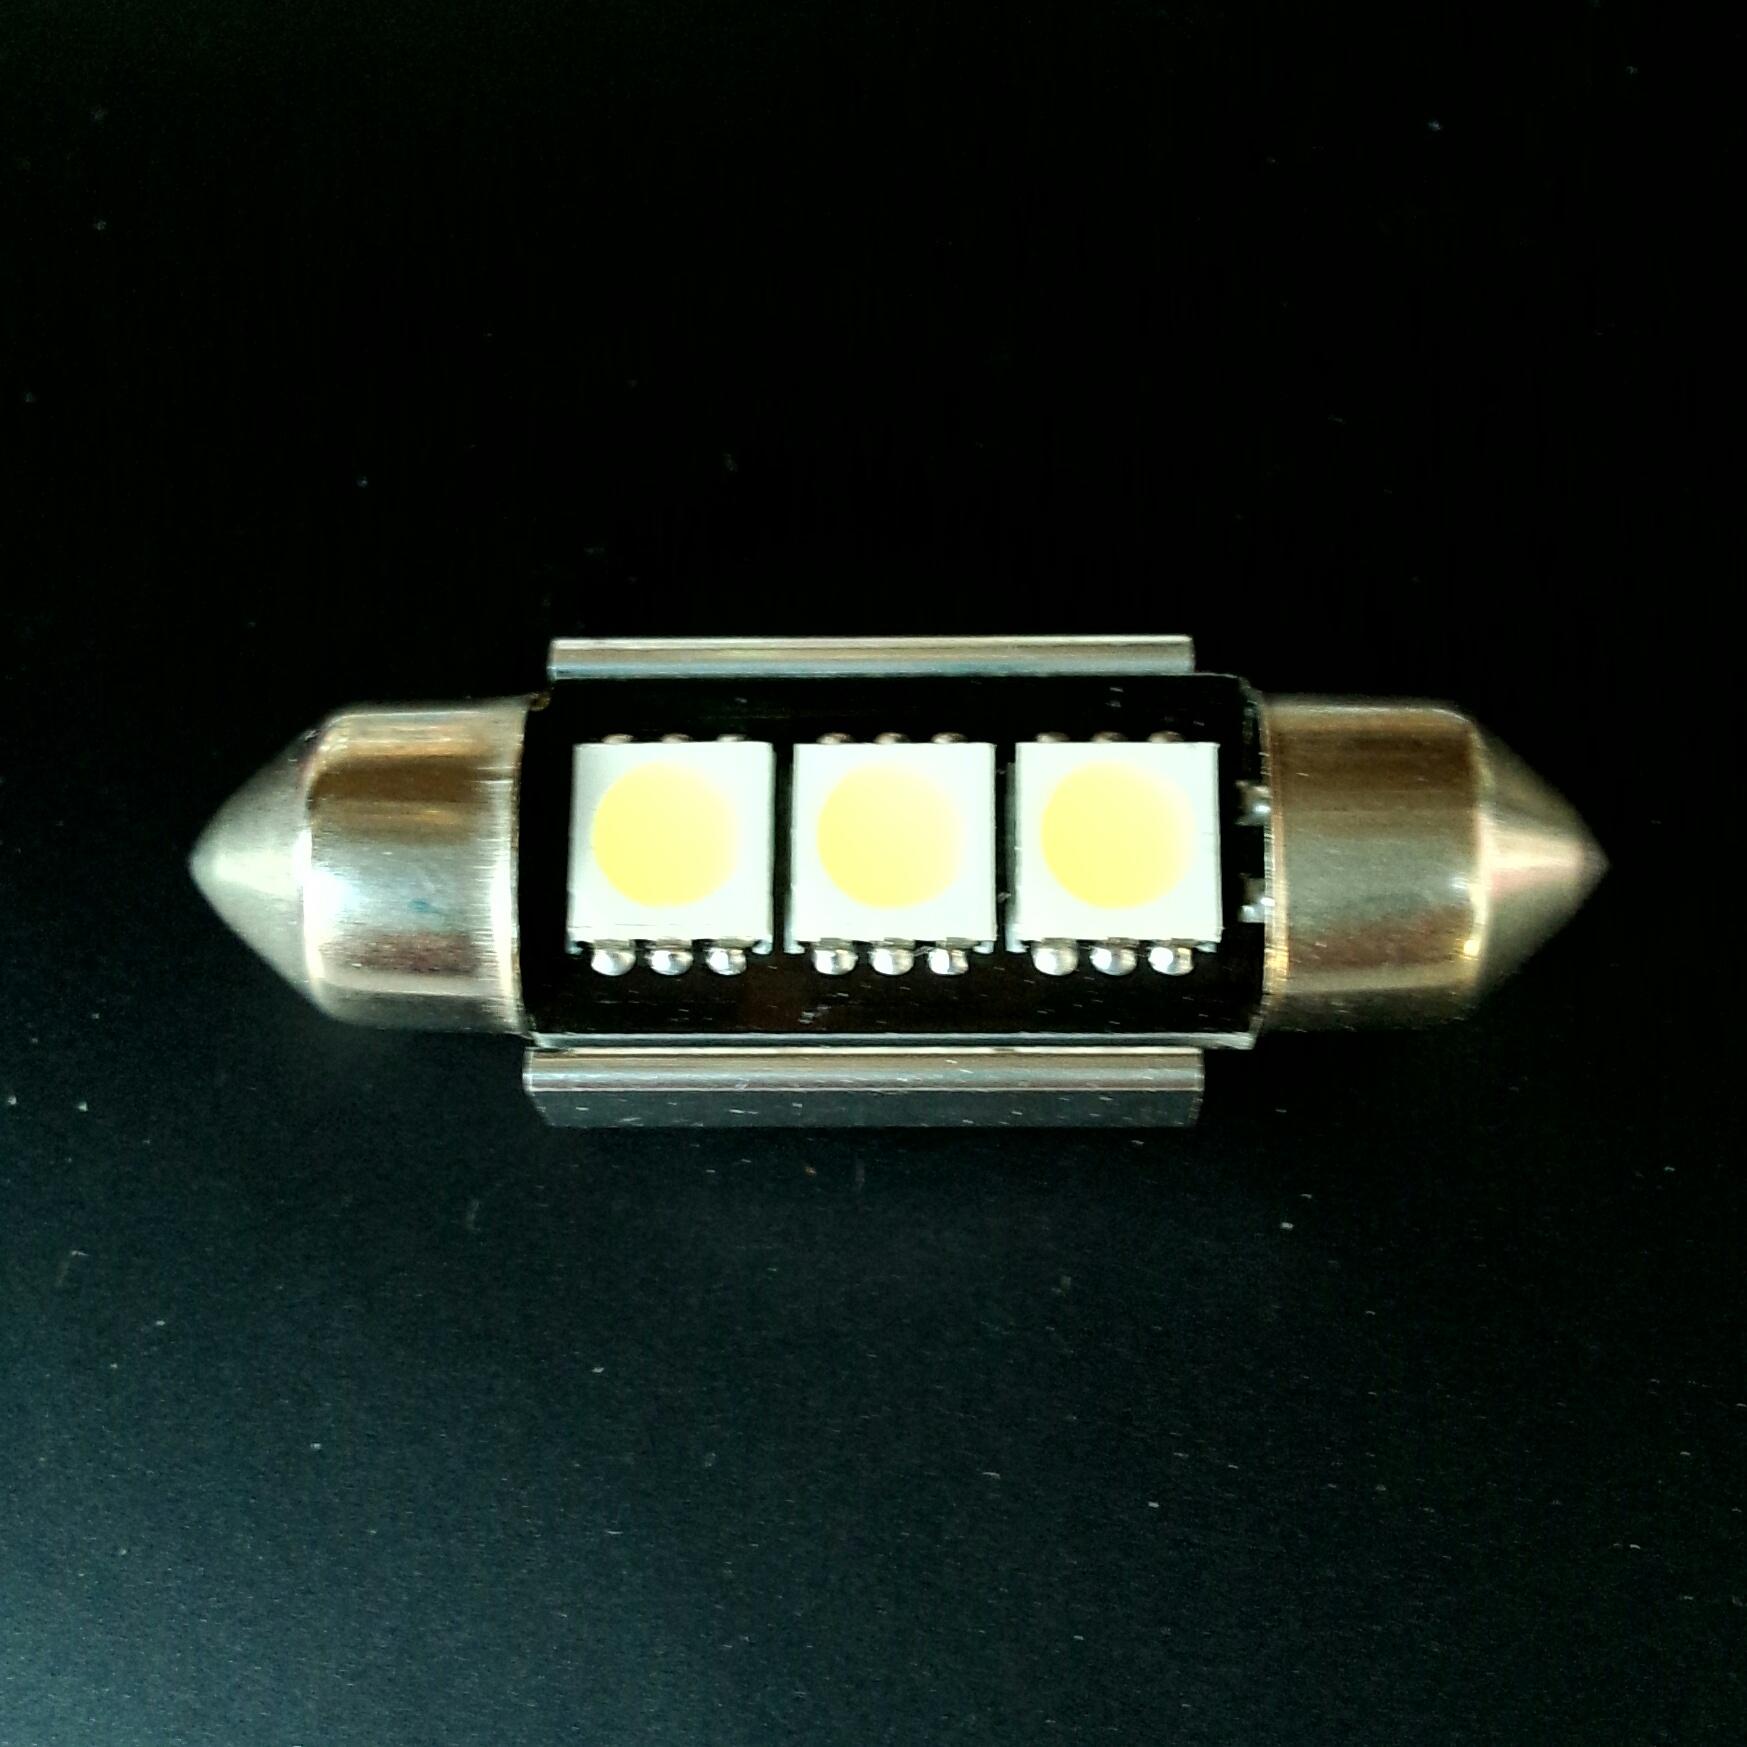 Автолампа Festoon 10,5x36 LED 3 smd 5050 SV8,5 12v canbus (обманка) 90Lm